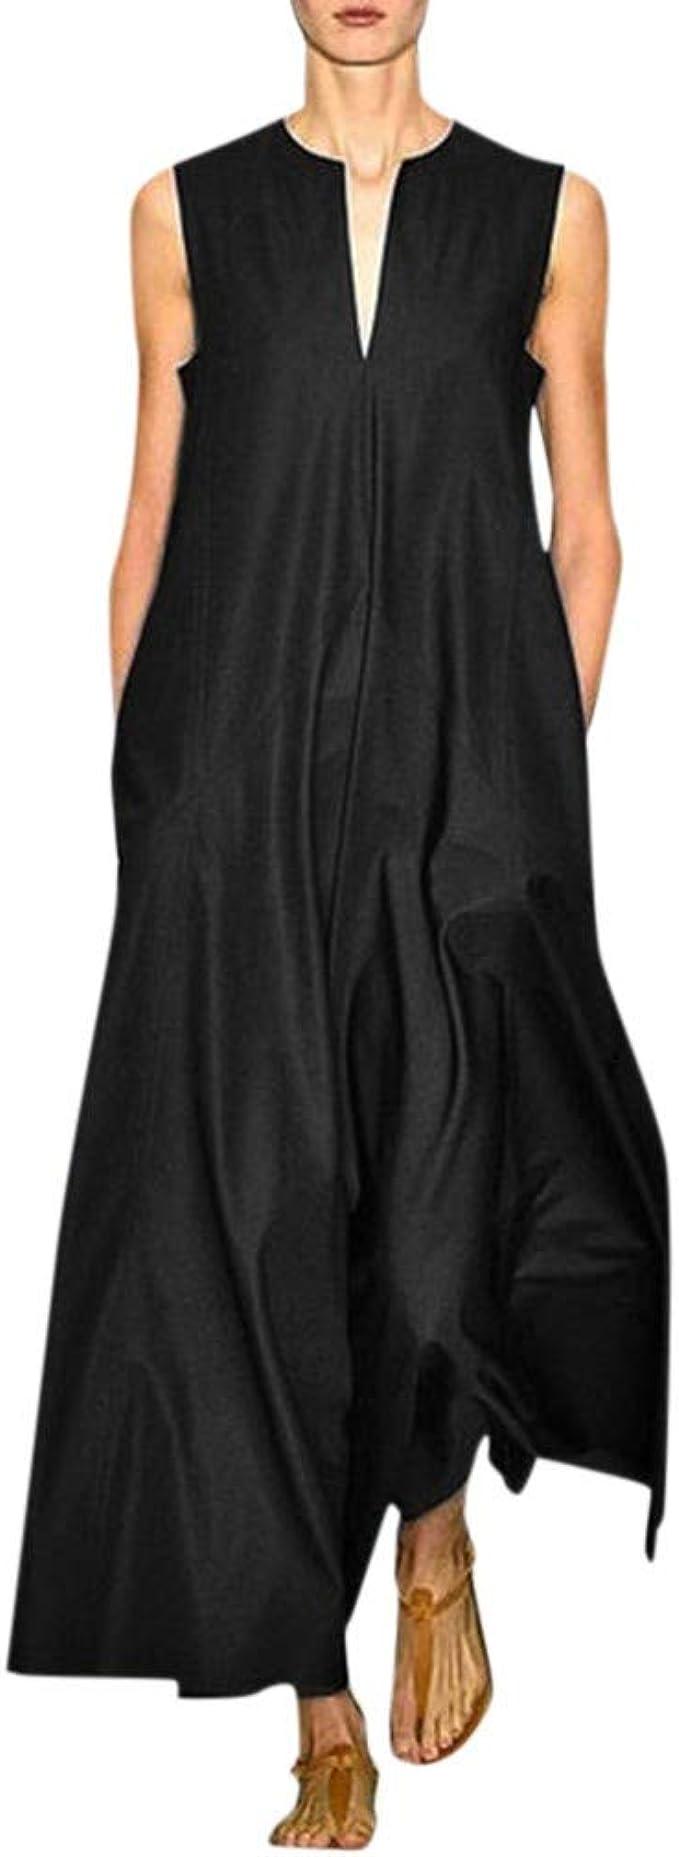 New Design  Cotton Dress Soft Long Sundress Casual Sleeveless Loose Summer Maxi Dresses Customized Plus Size Clothing Linen